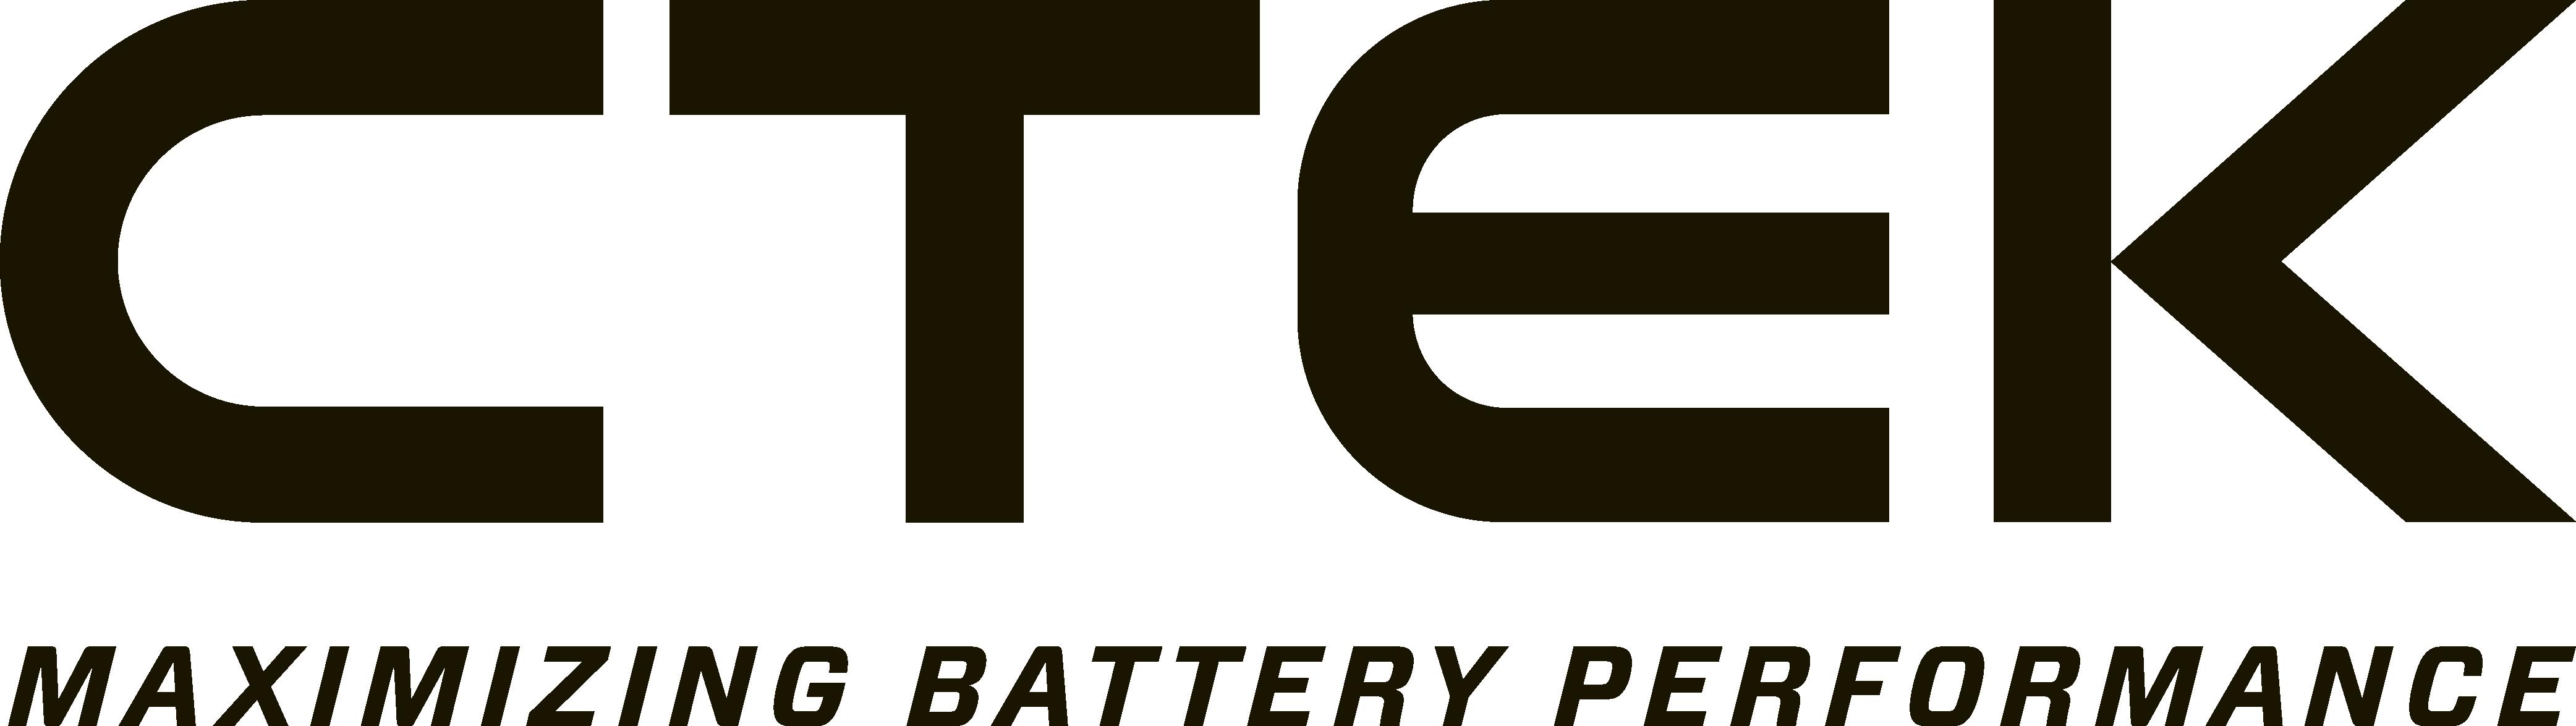 CTEK_logotype_TAGLINE